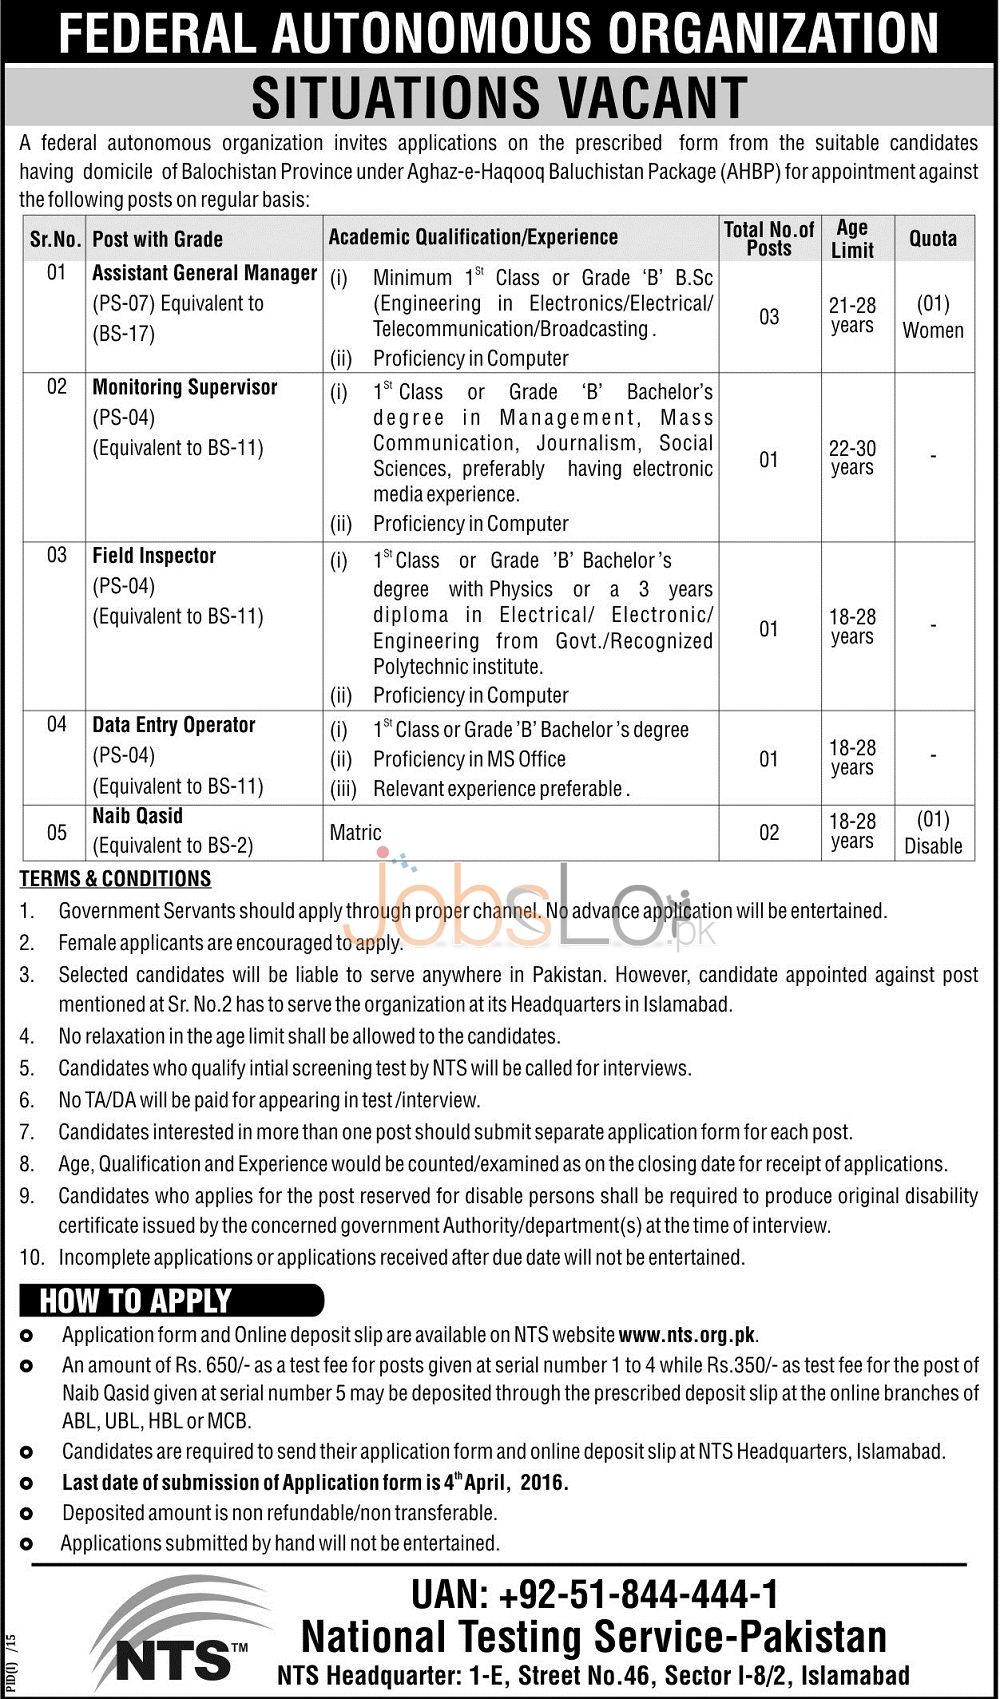 Recruitment Offers in Federal Autonomous Organization Balochistan Jobs 20 March 2016 NTS Application Form Latest